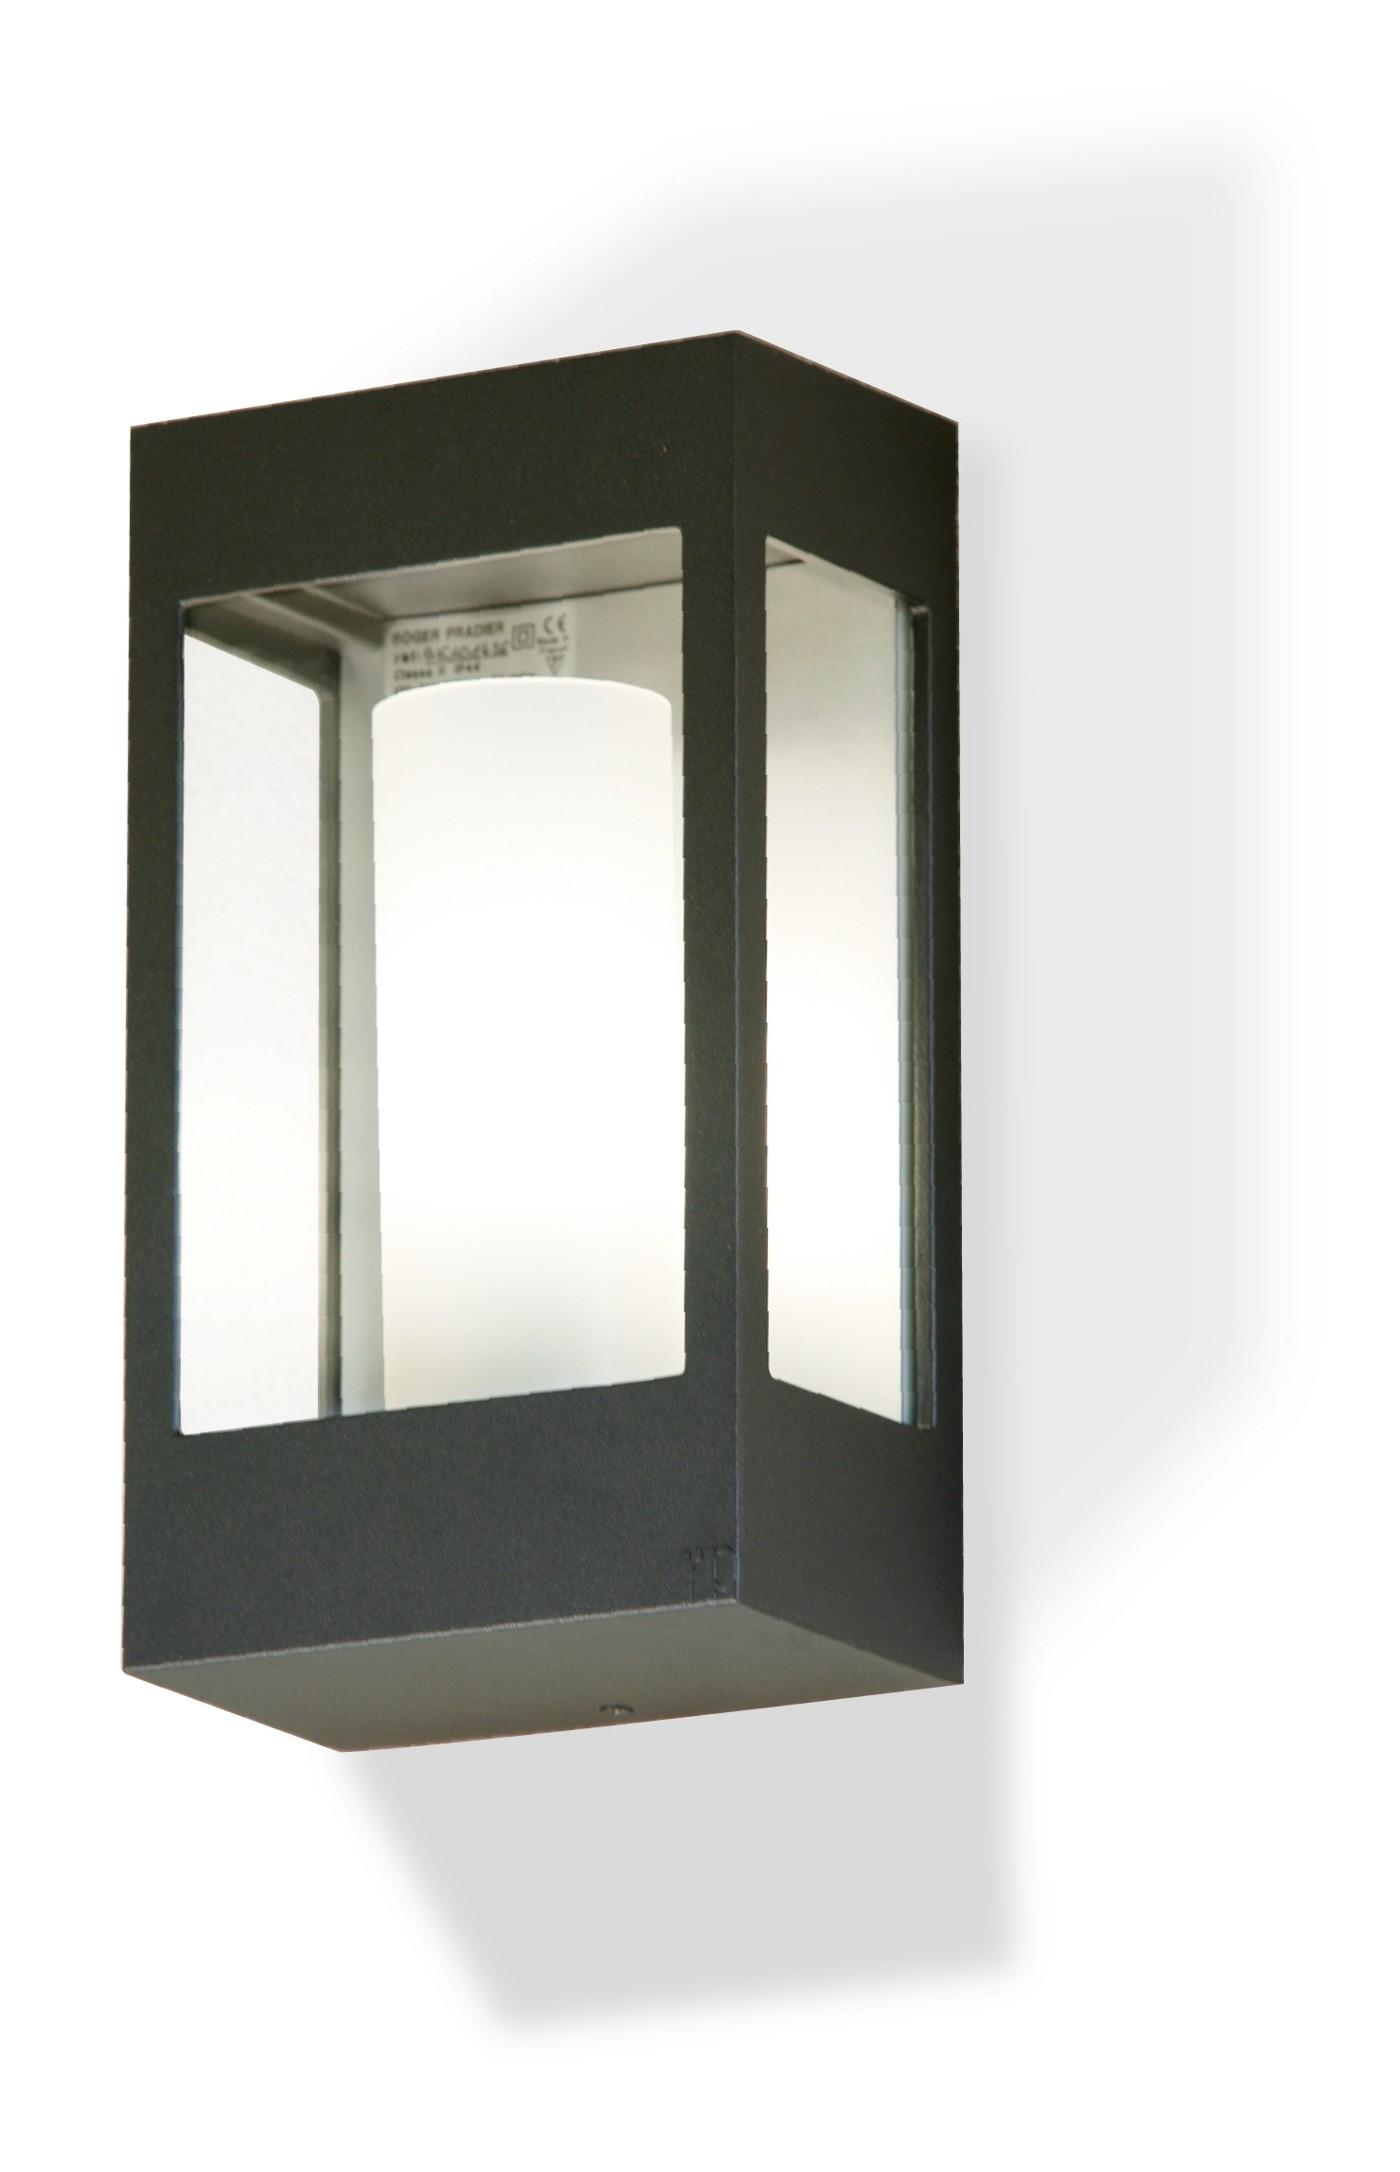 applique brick de roger pradier gris anthracite. Black Bedroom Furniture Sets. Home Design Ideas